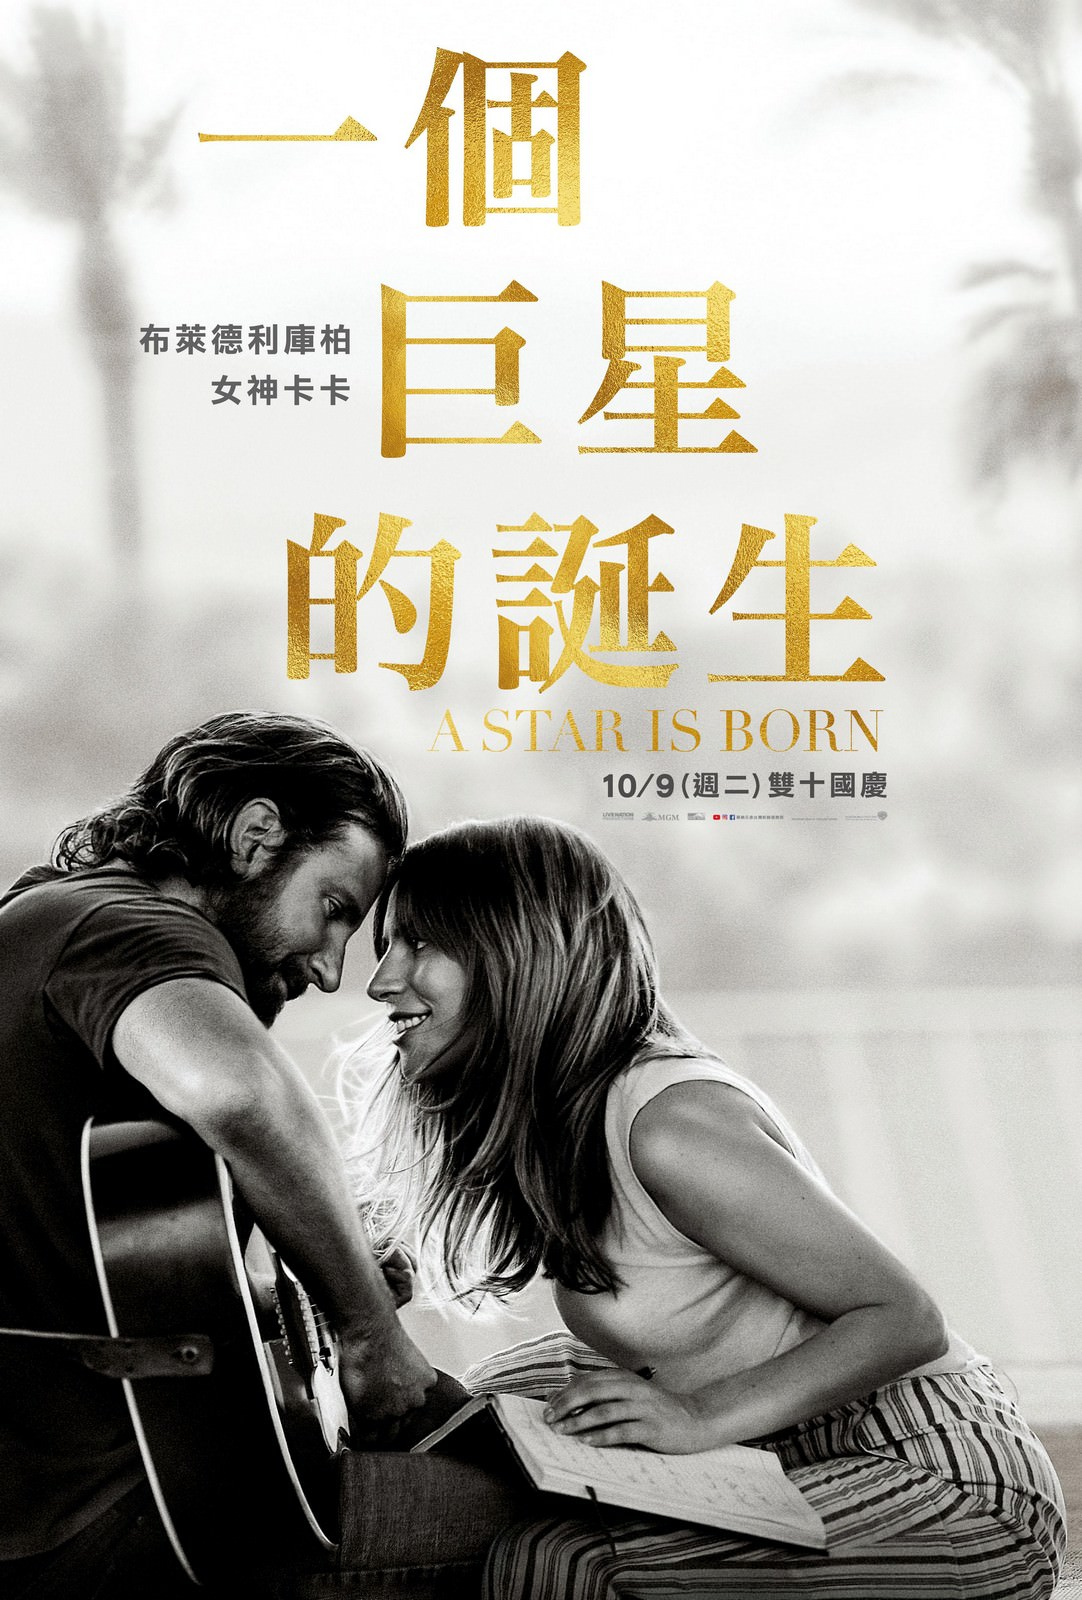 Movie, A Star Is Born(美國, 2018年) / 一個巨星的誕生(台灣) / 星夢情深(香港) / 一个明星的诞生(網路), 電影海報, 台灣